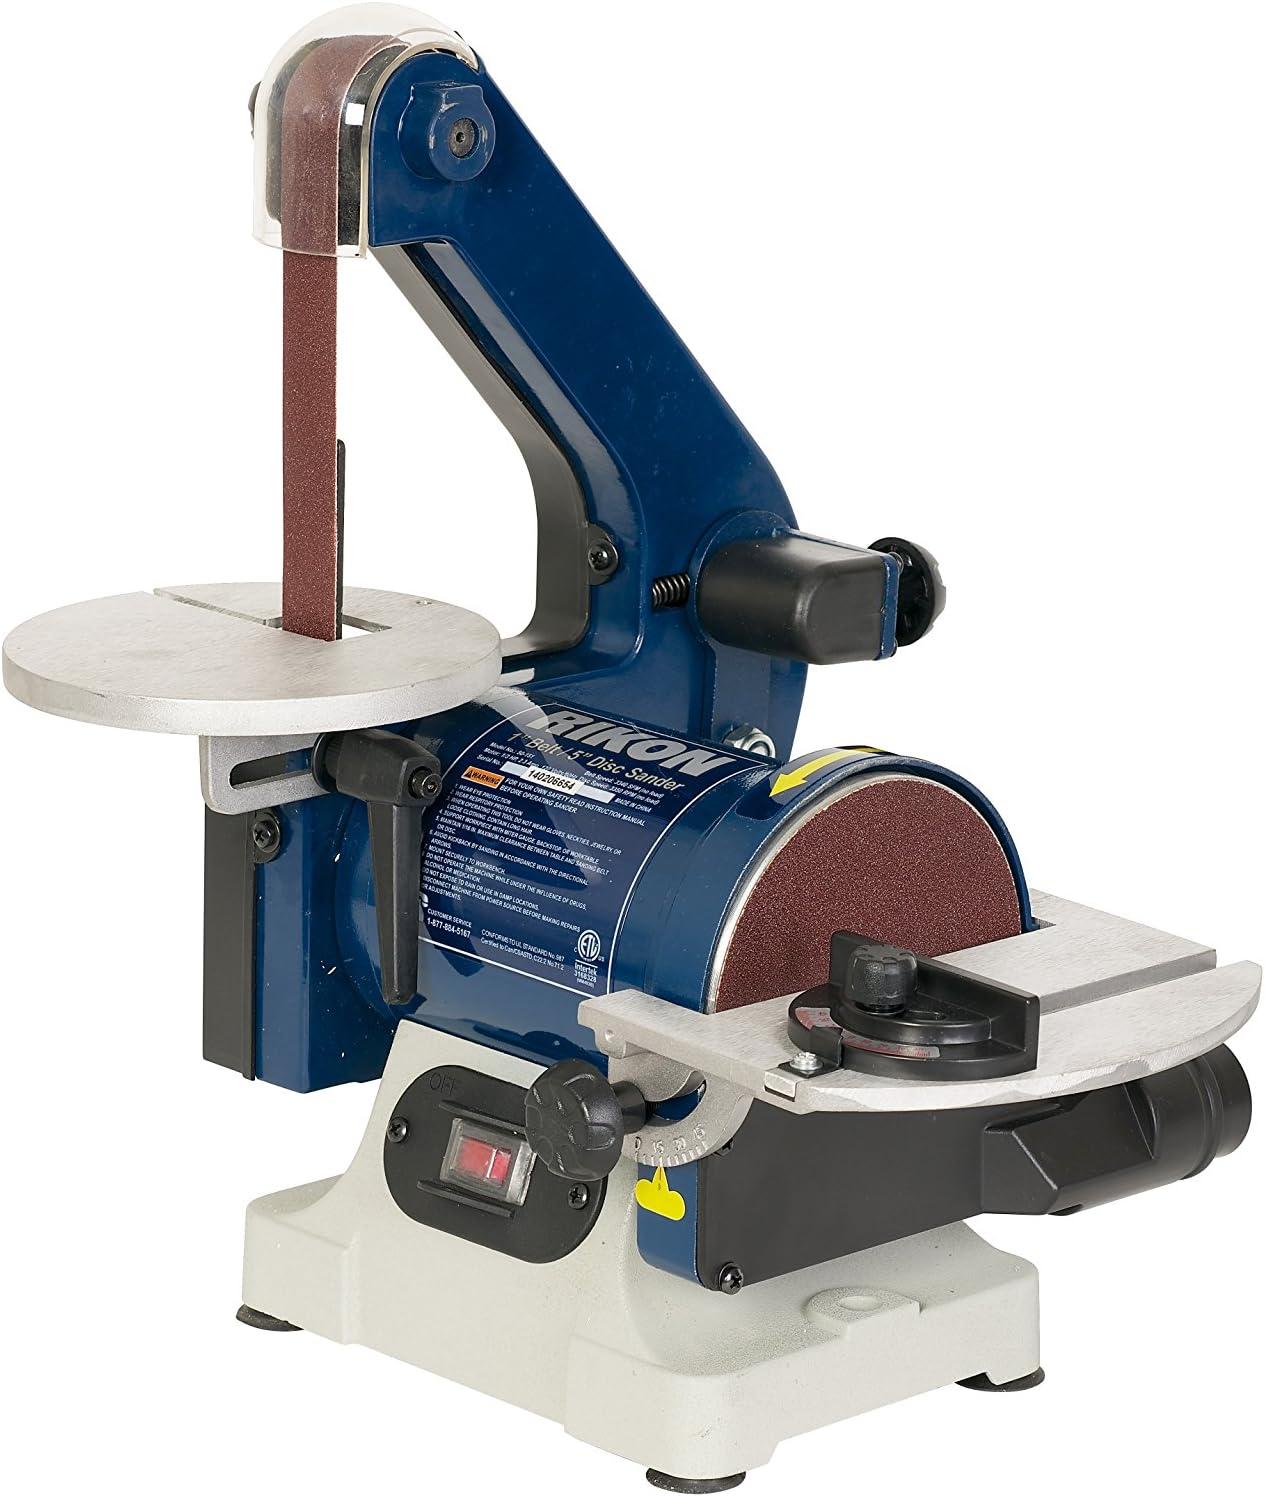 RIKON Power Tools 50-151 Belt and Disk Sander Combo, Blue